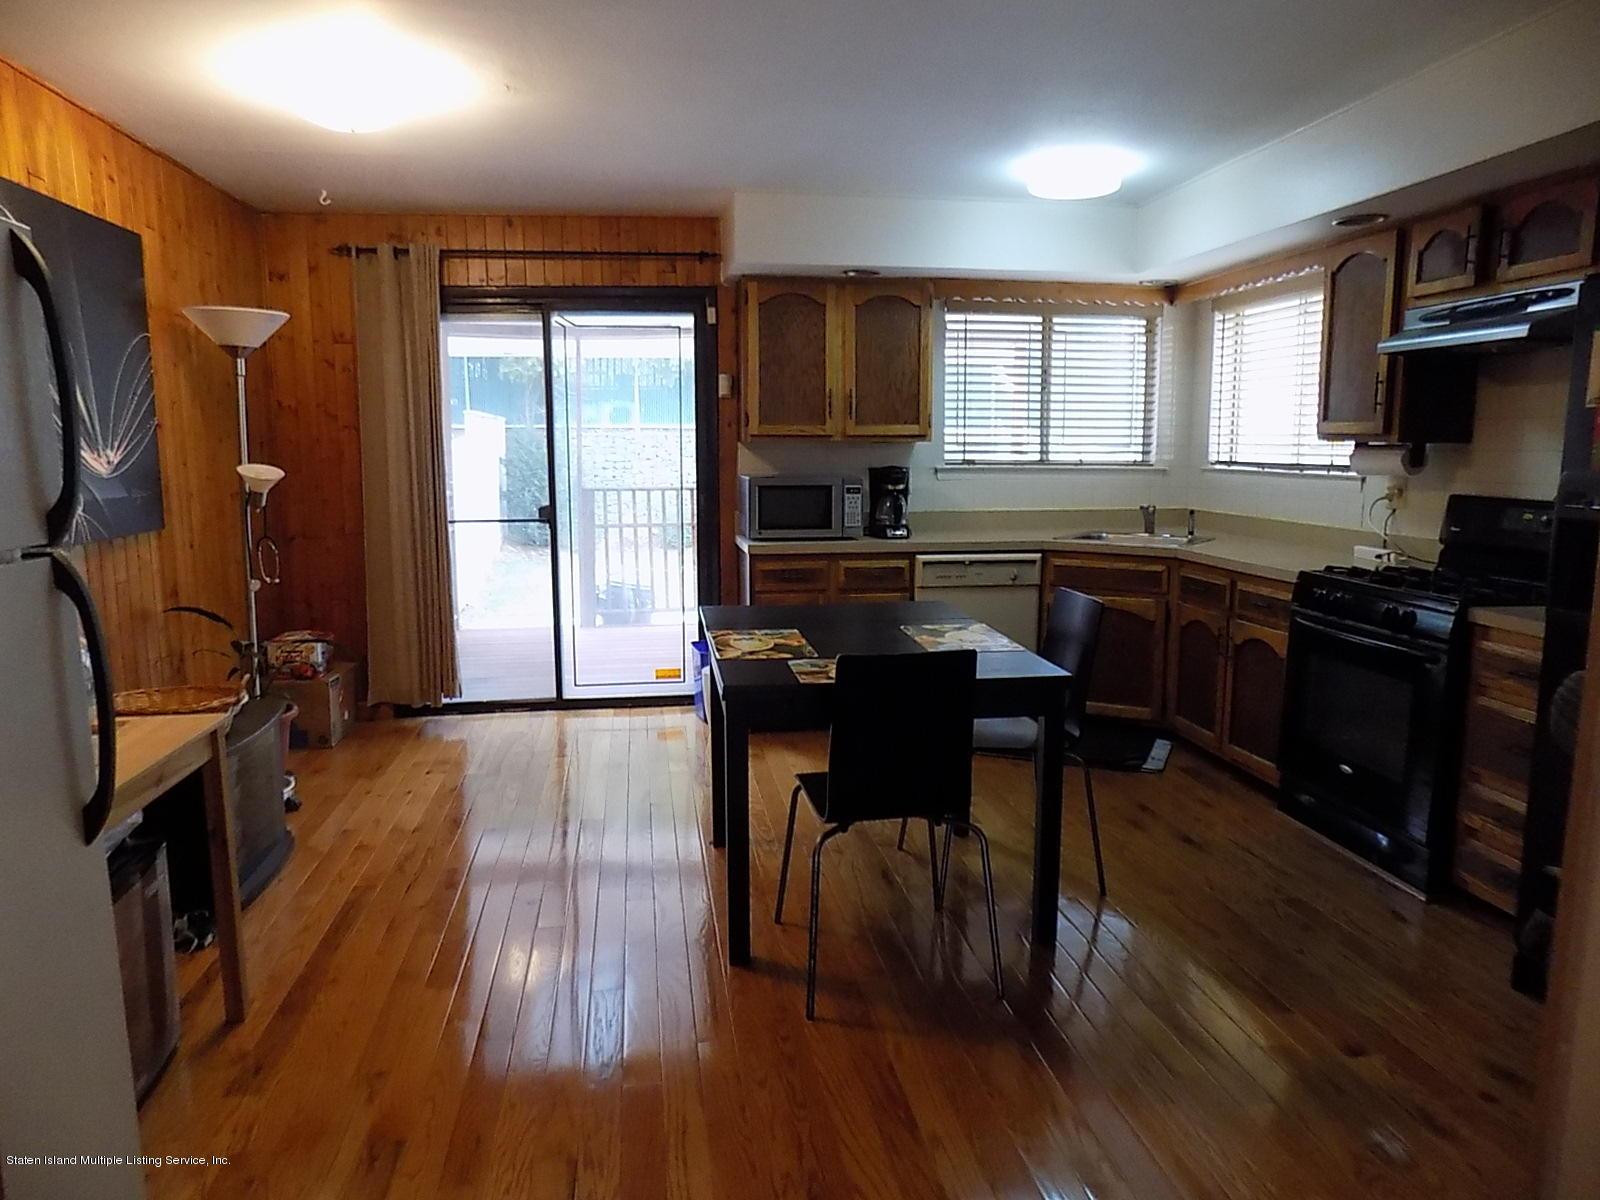 Single Family - Semi-Attached 85 Bogota Street  Staten Island, NY 10314, MLS-1126026-8